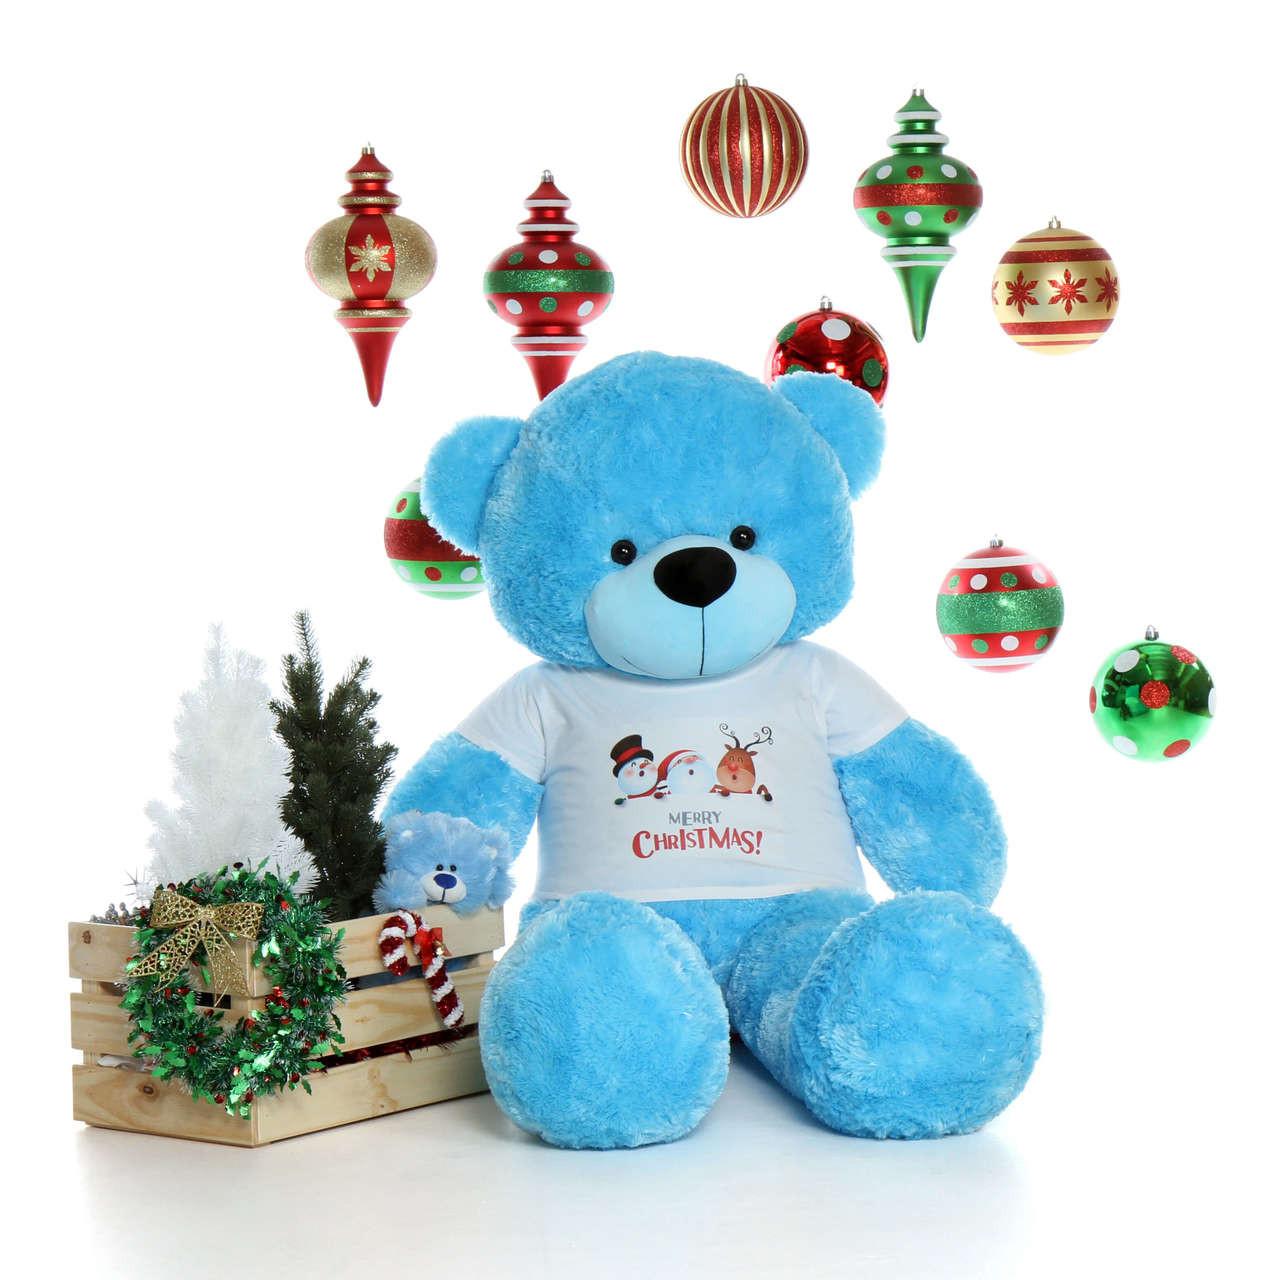 60in Happy Cuddles Ready for Christmas Giant Blue Teddy Bear